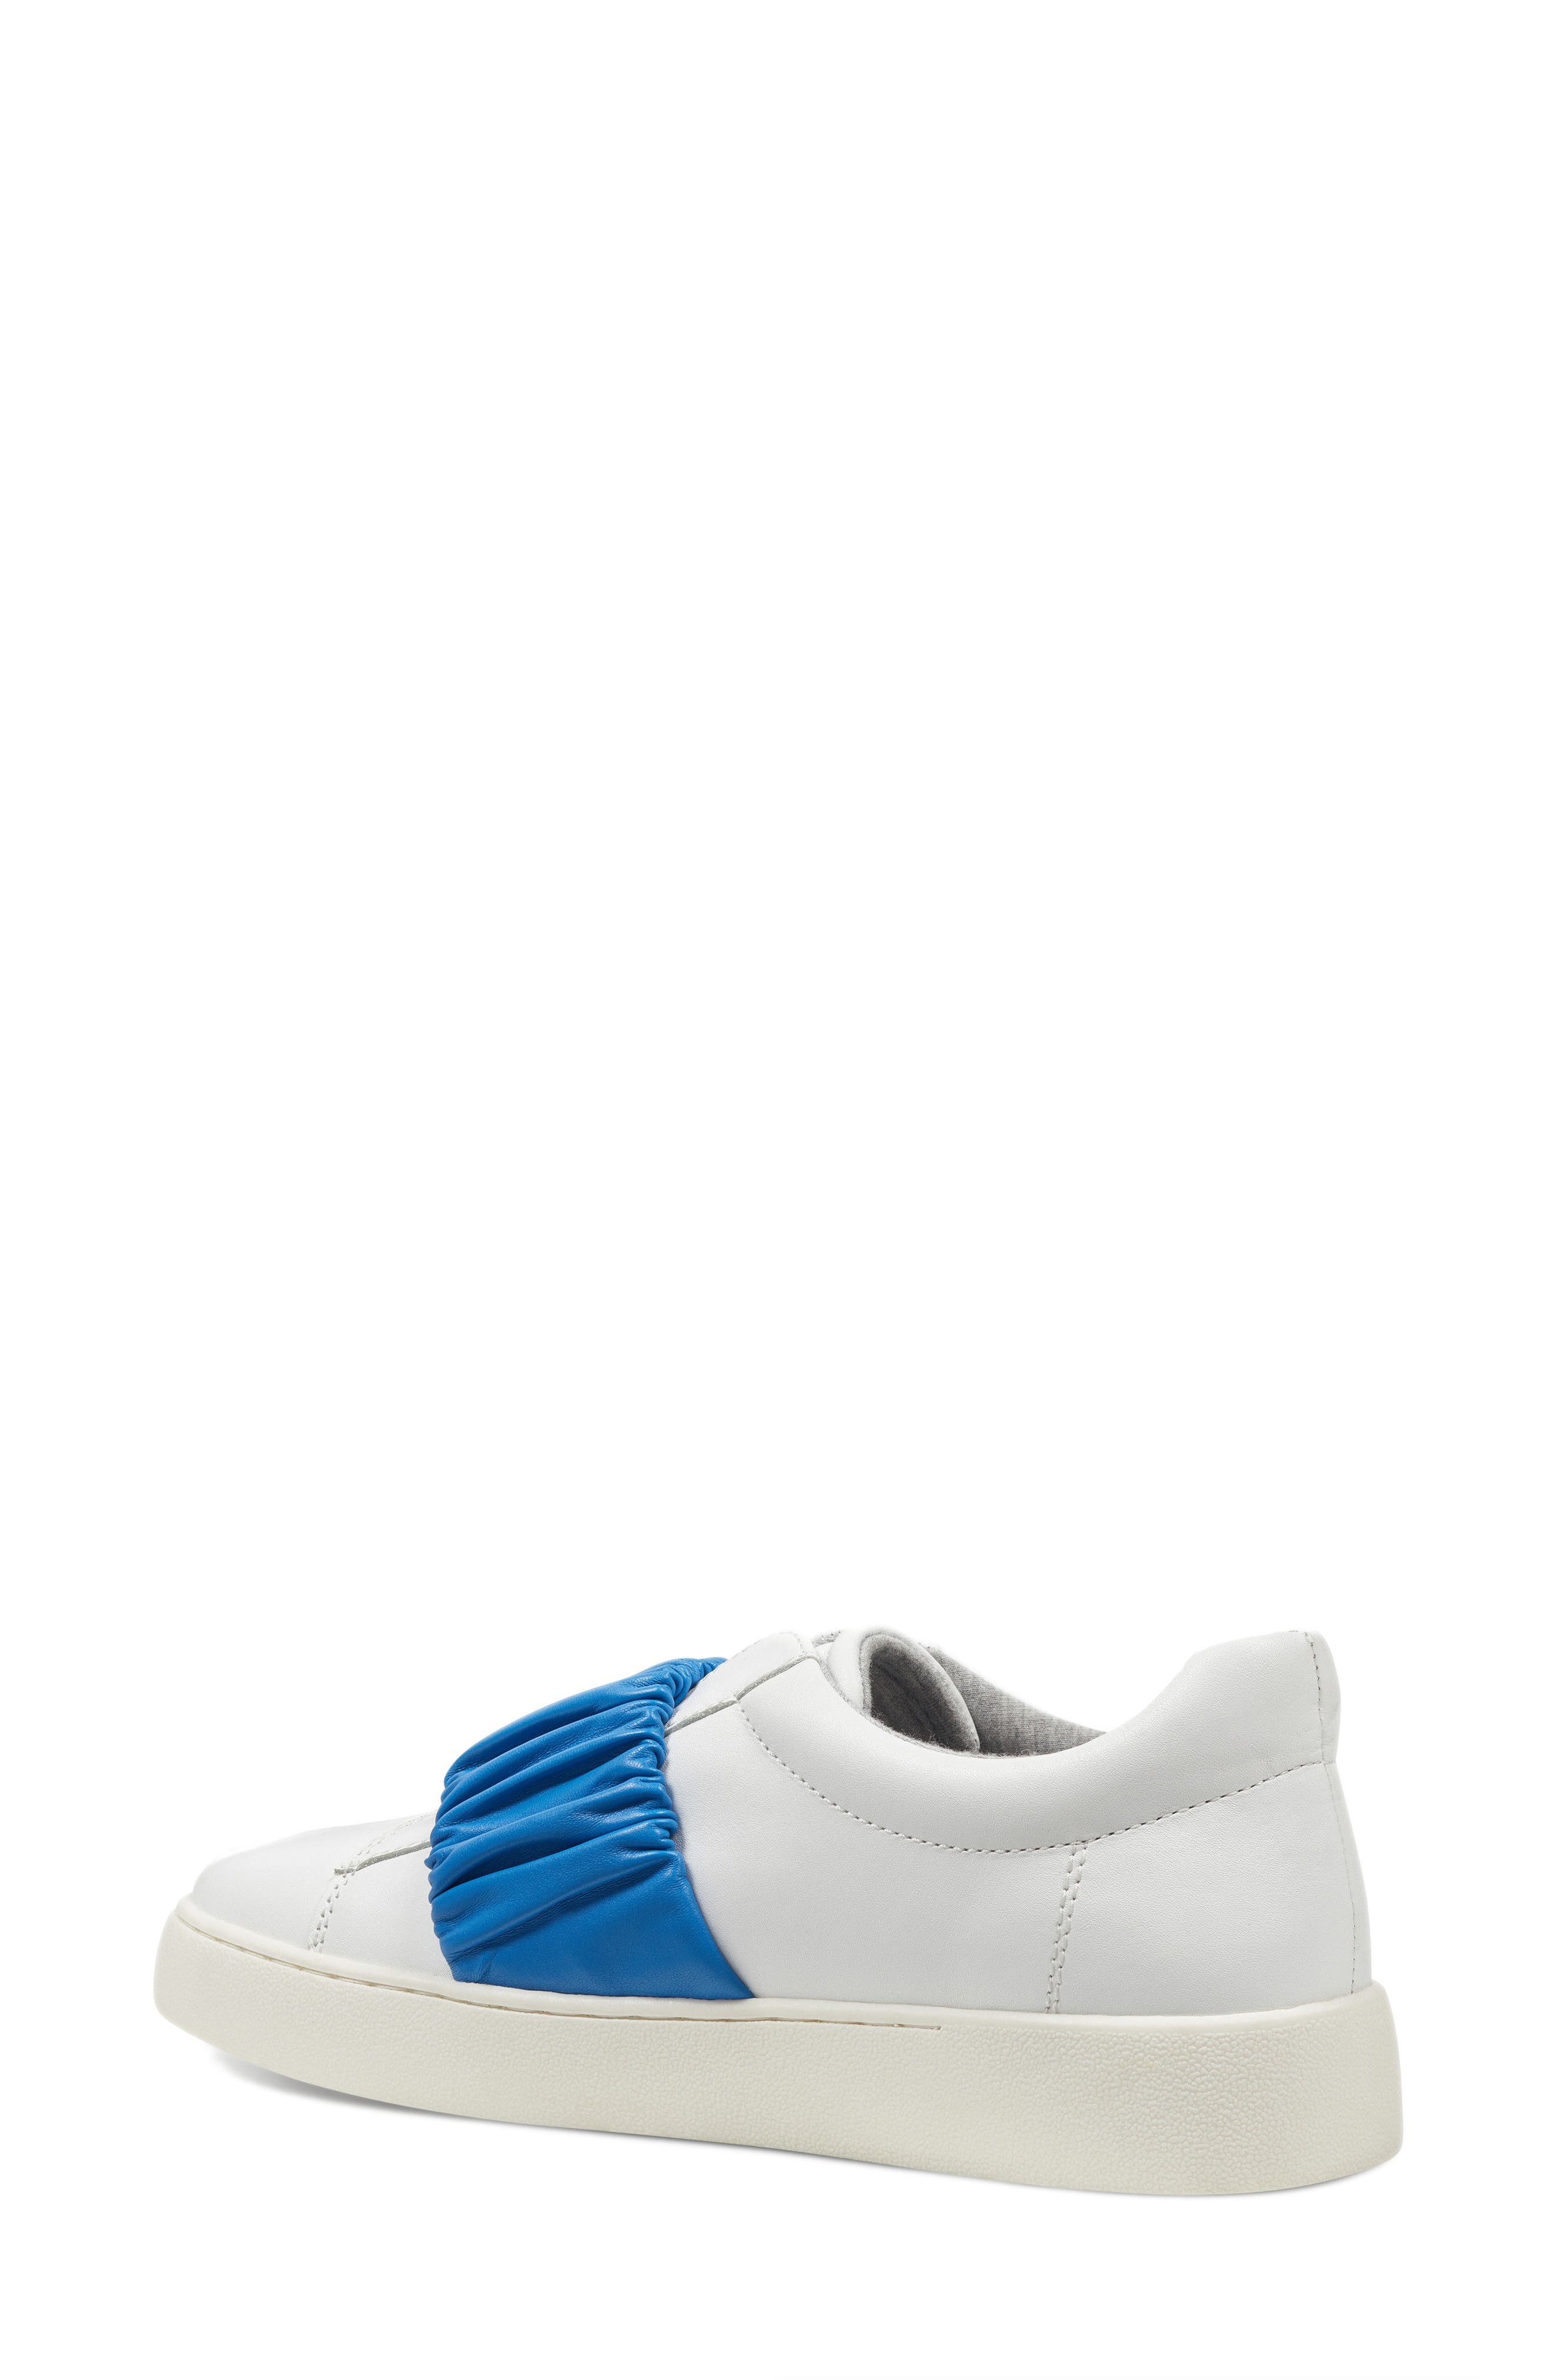 Pindiviah Slip-On Sneaker,                             Alternate thumbnail 2, color,                             100